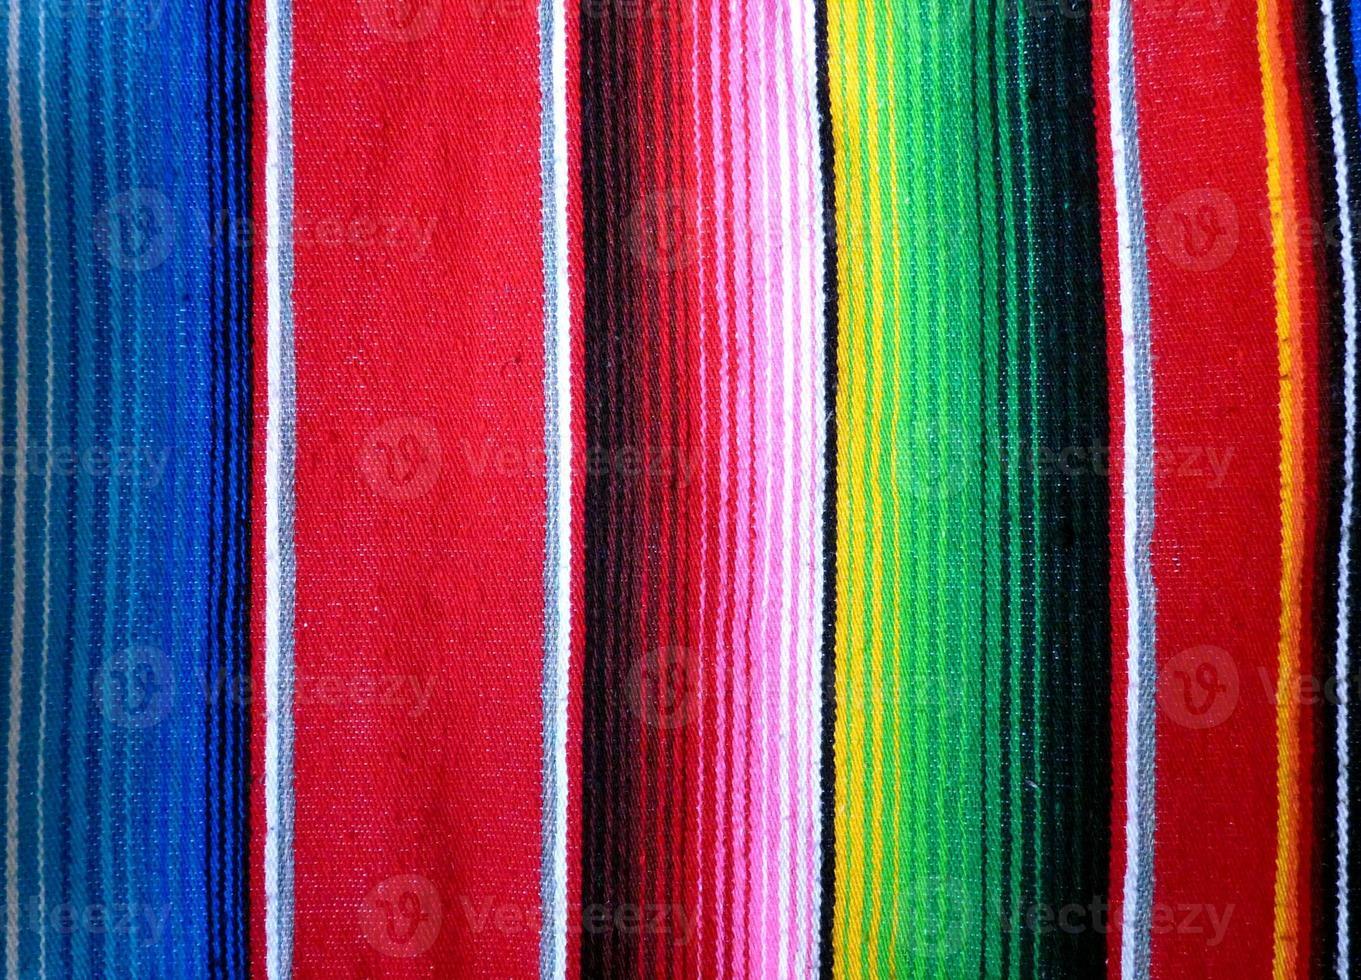 close-up van de hand geweven poncho achtergrond foto